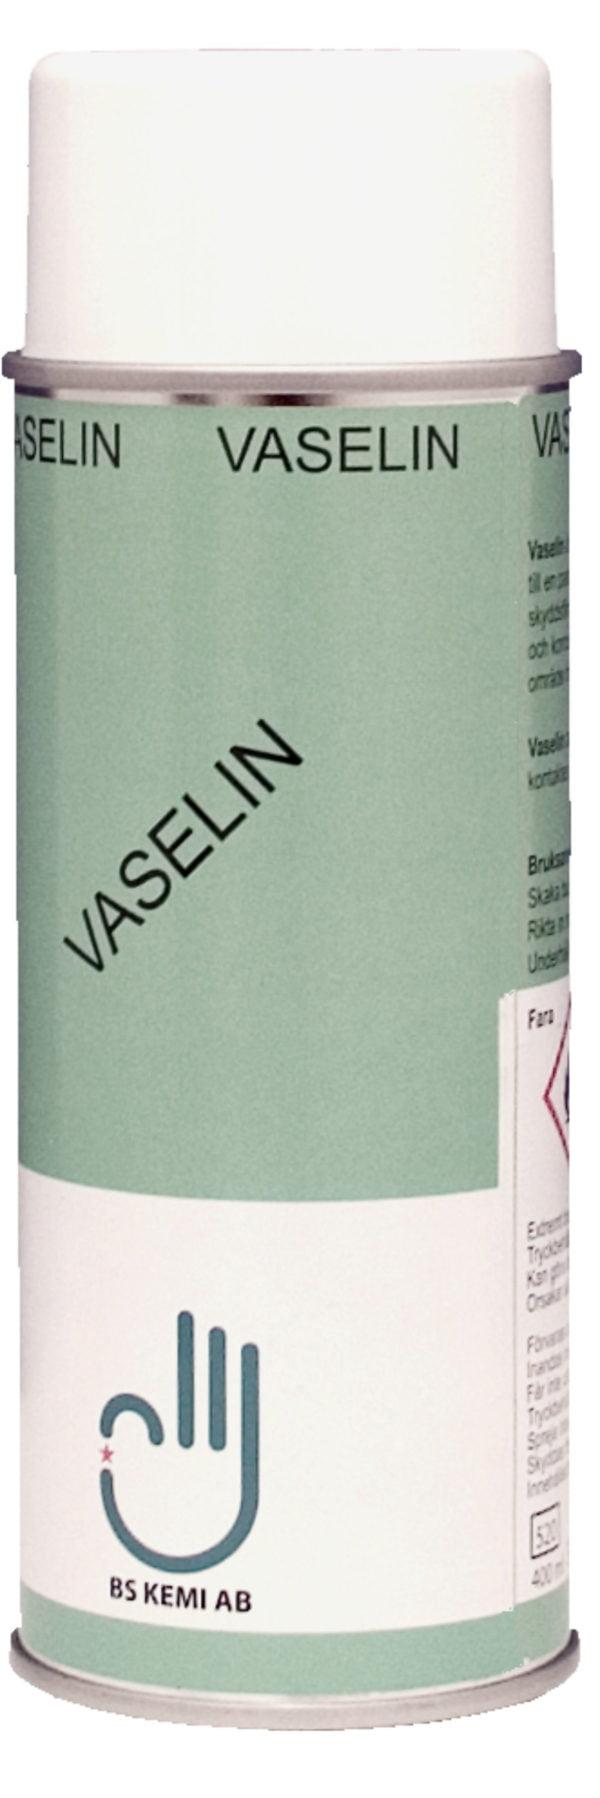 Vaselin, 400 ML 1